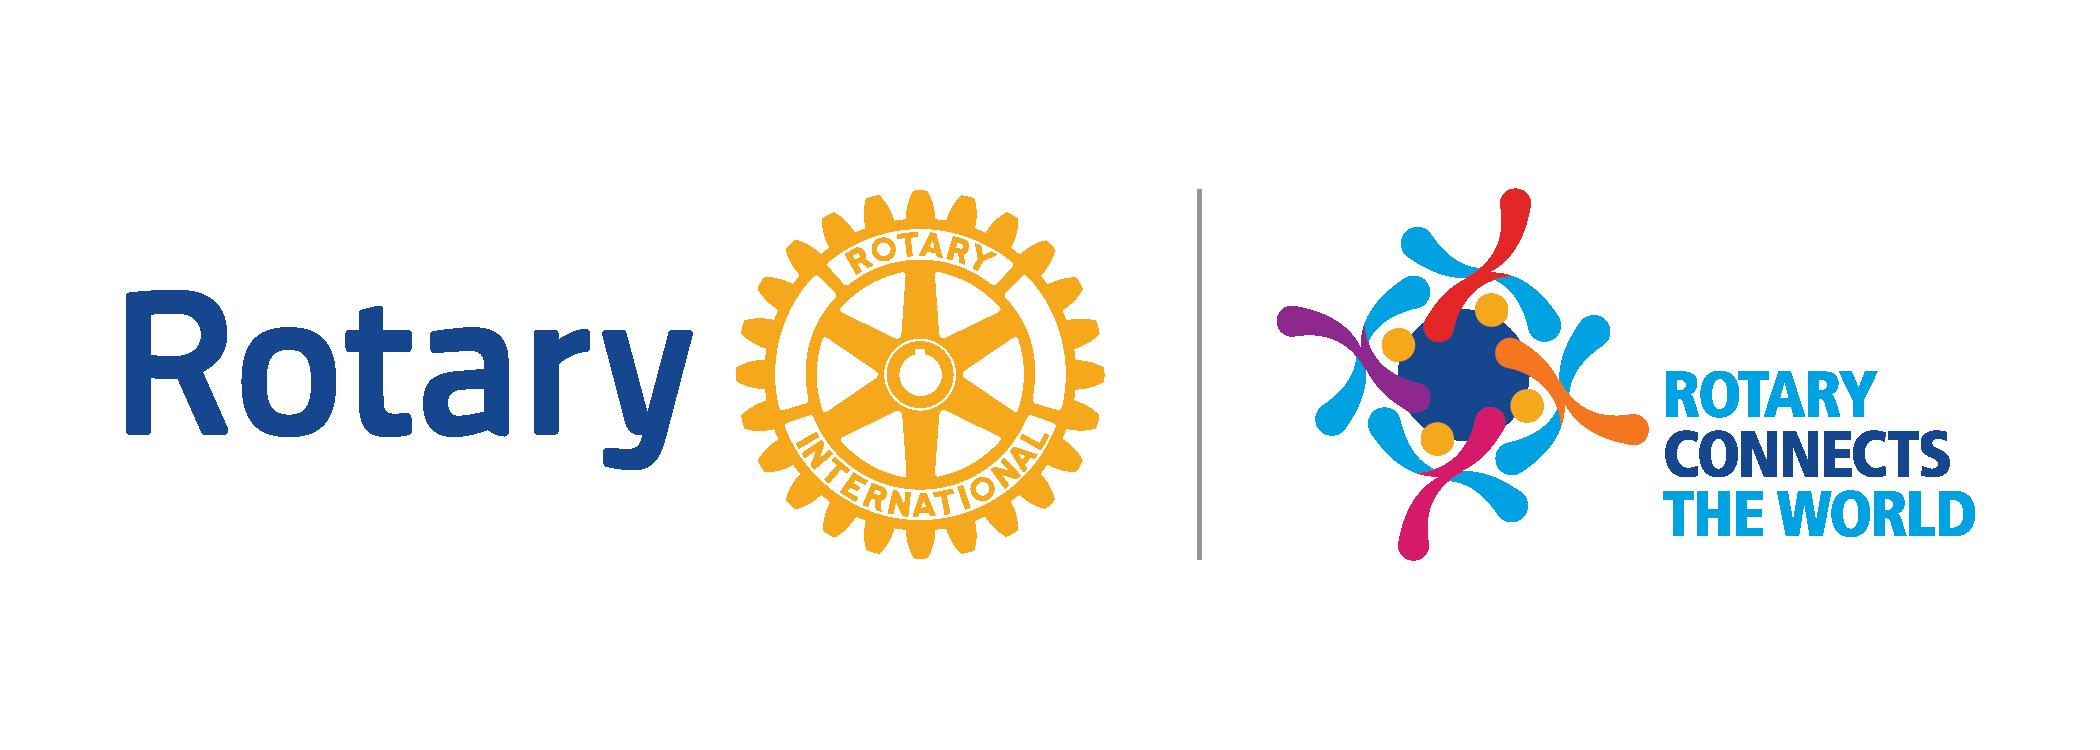 Rotary Club of St. Maarten Mid-Isle